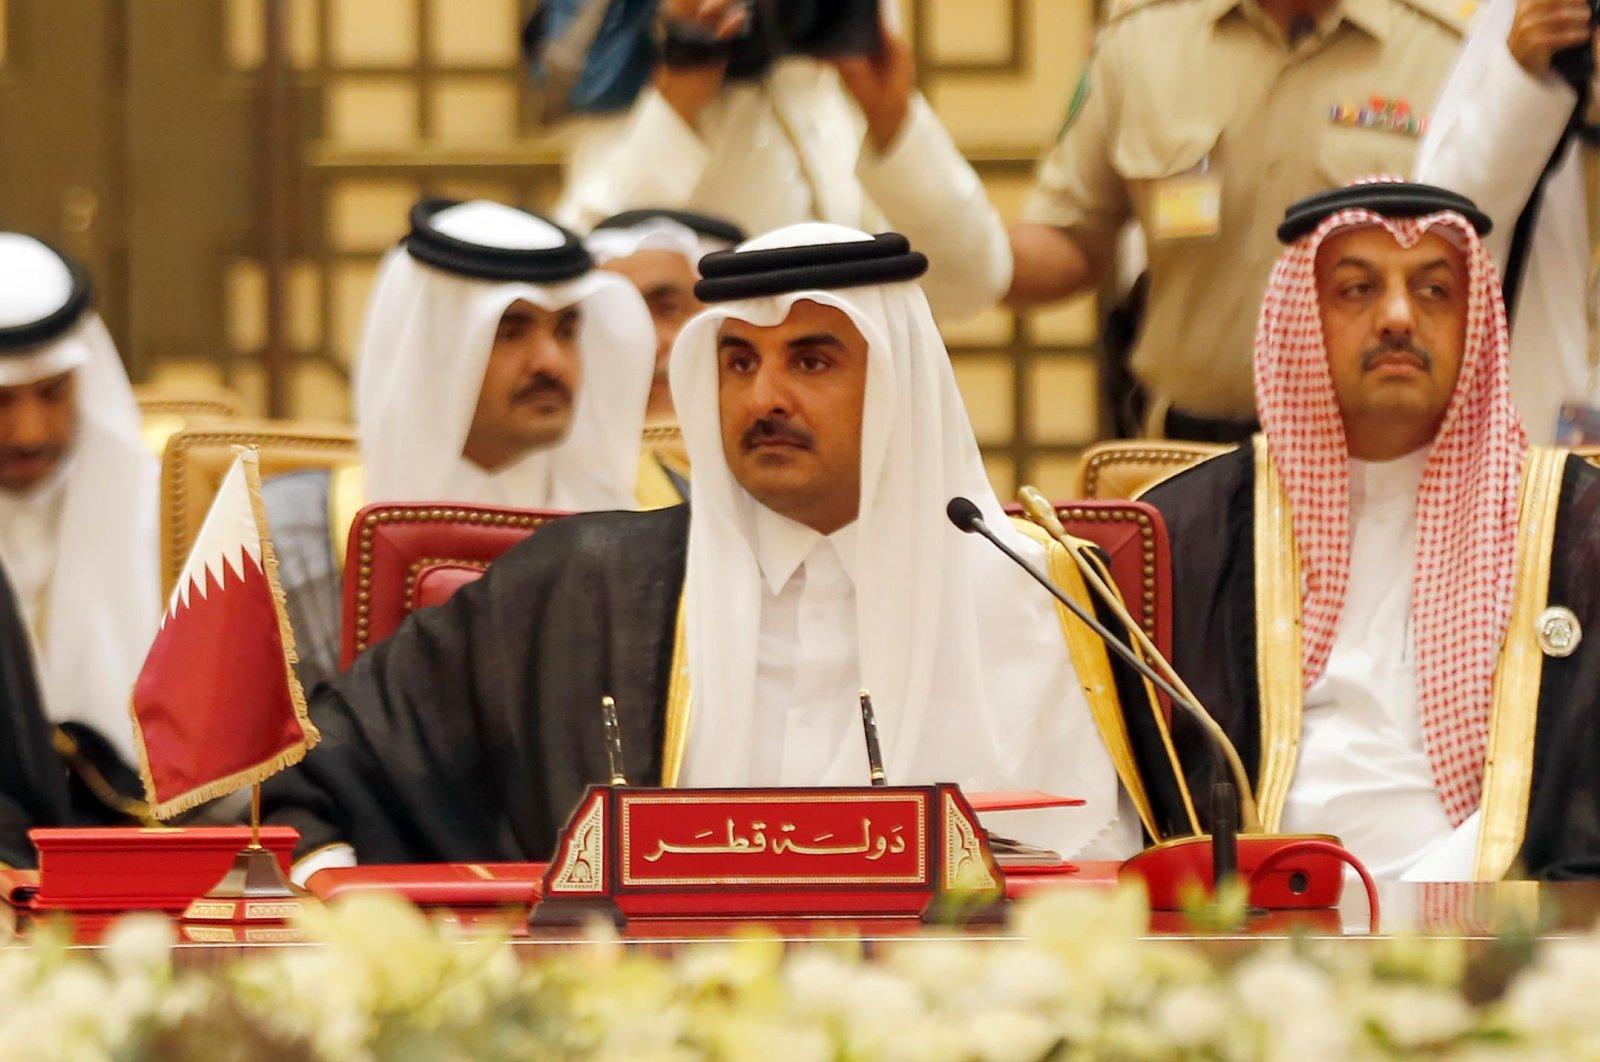 Qatar's Emir Sheikh Tamim bin Hamad Al Thani attending a Gulf Cooperation Council (GCC) summit in the capital of Manama, Bahrain, Dec. 6, 2016. (AFP Photo)